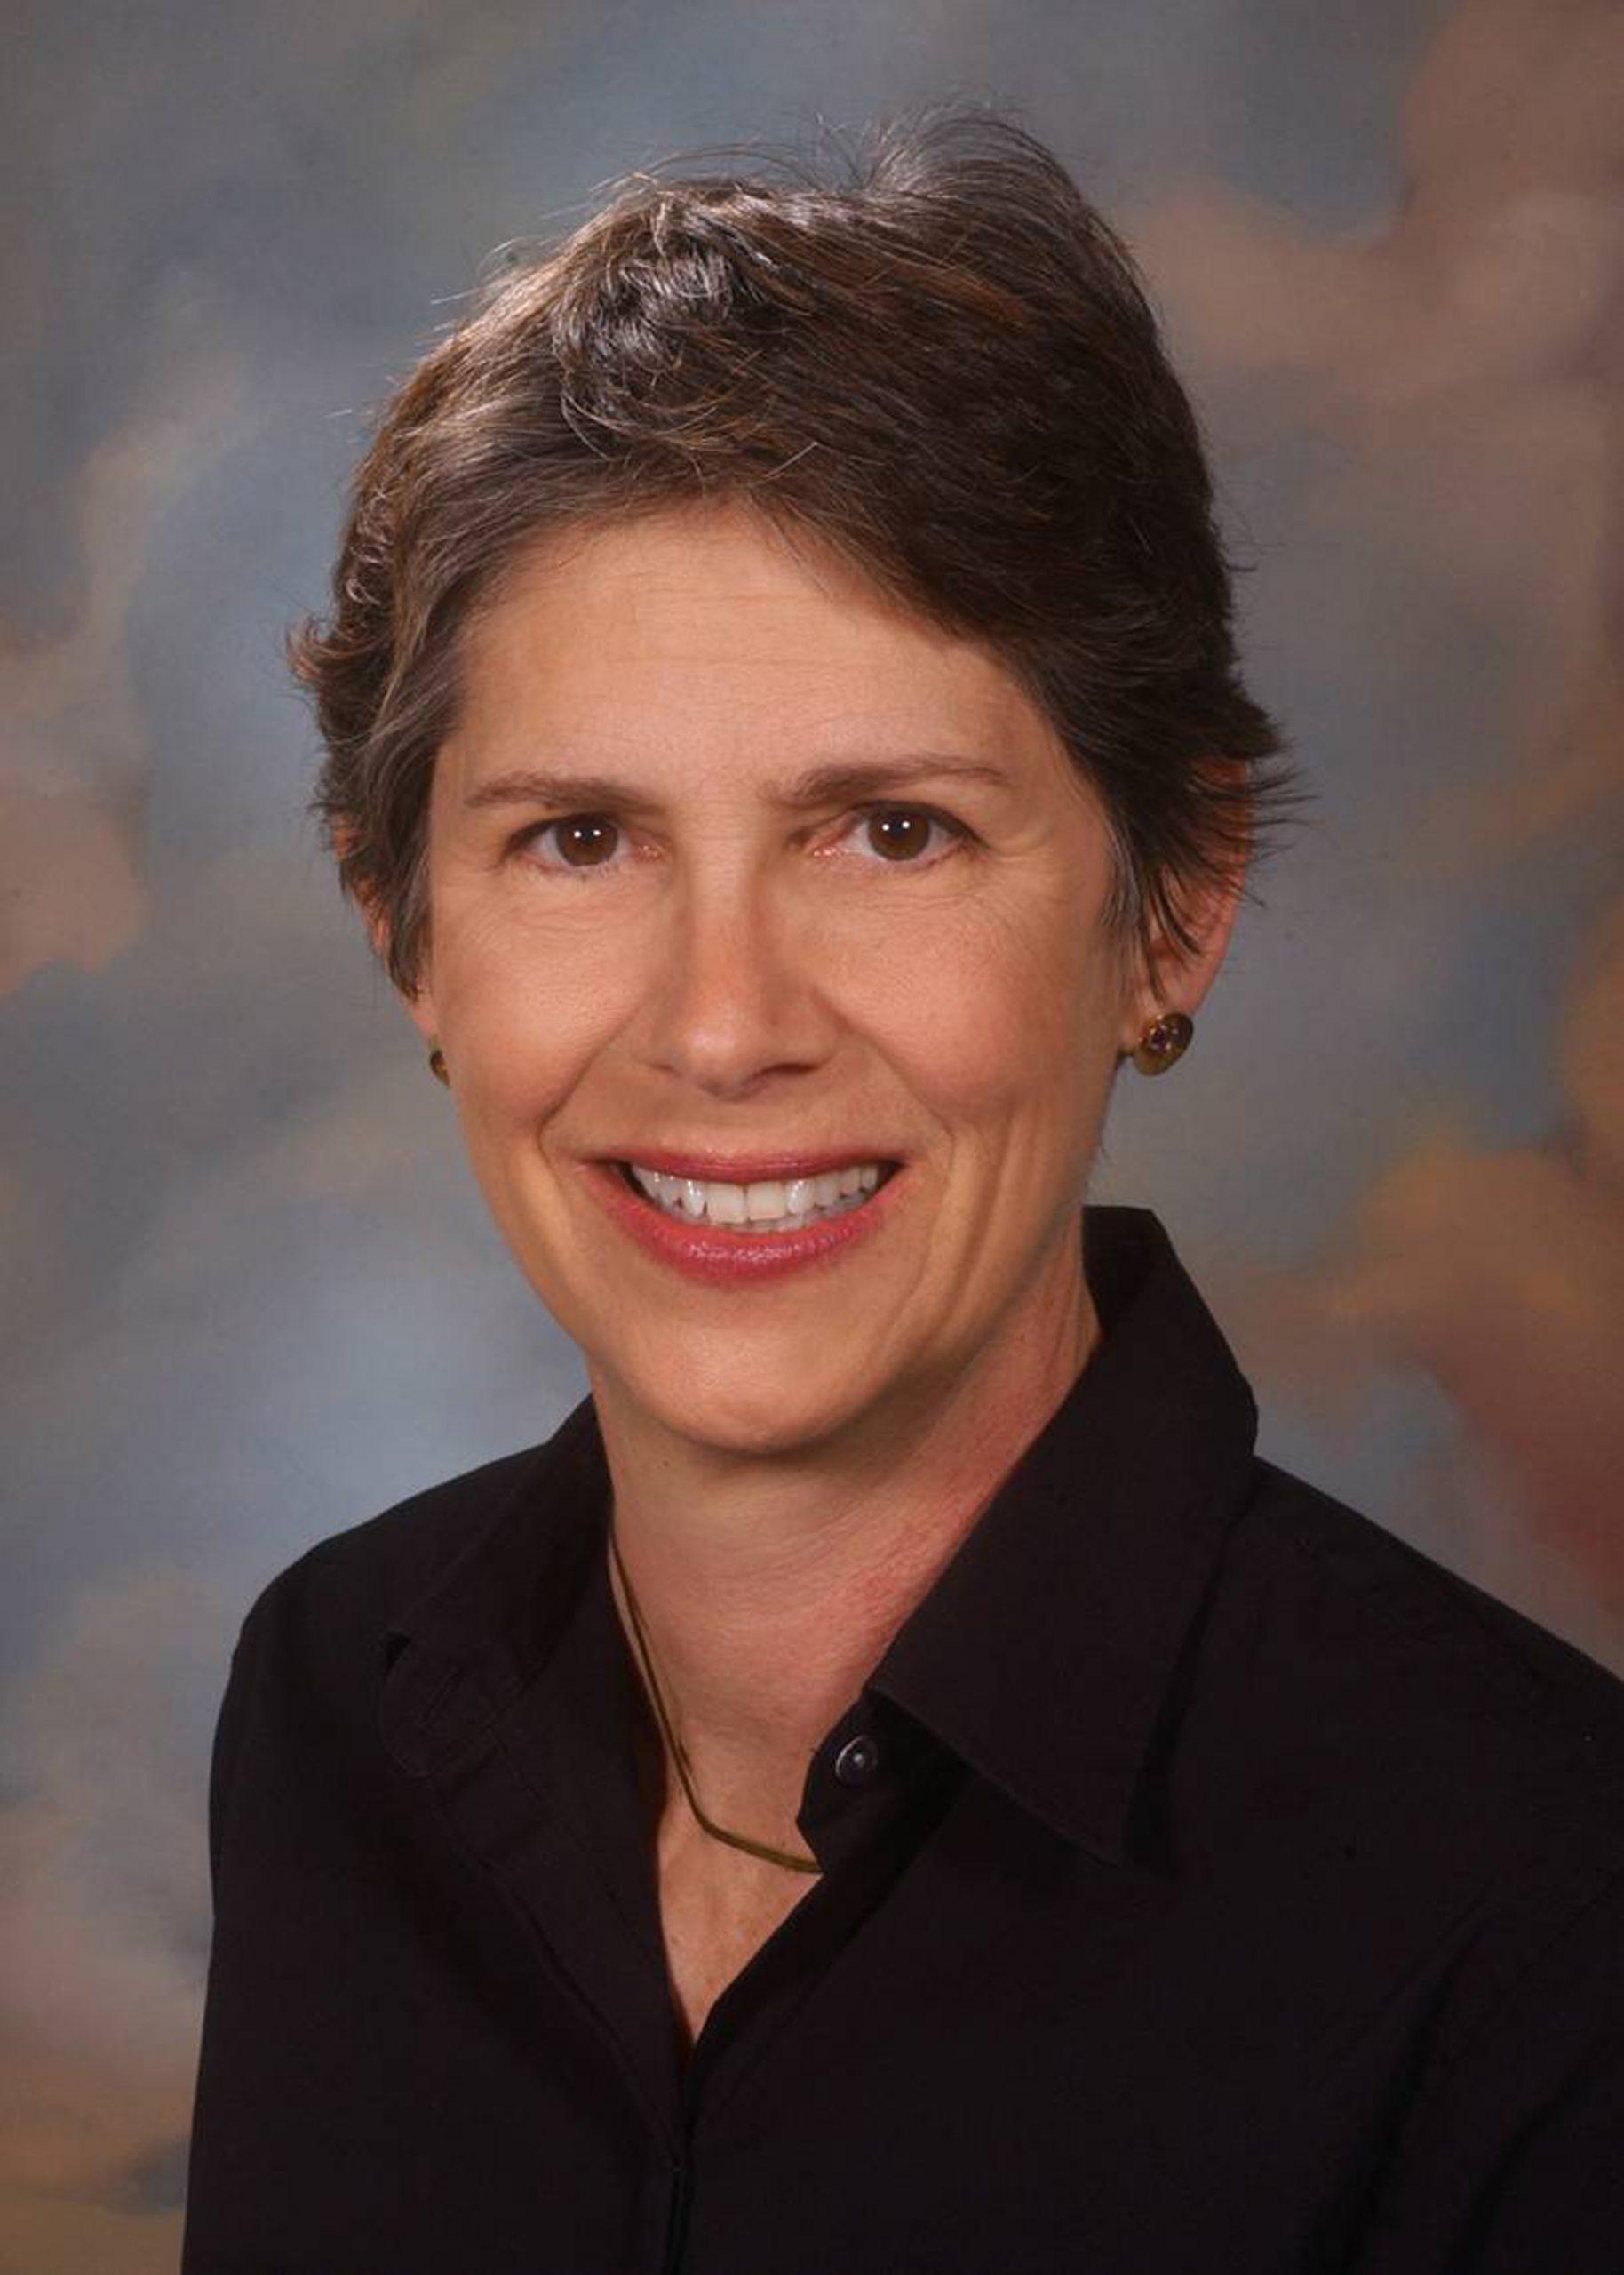 2012 American College of Surgeons/Pfizer Surgical Humanitarian Award winner Catherine DeVrise.